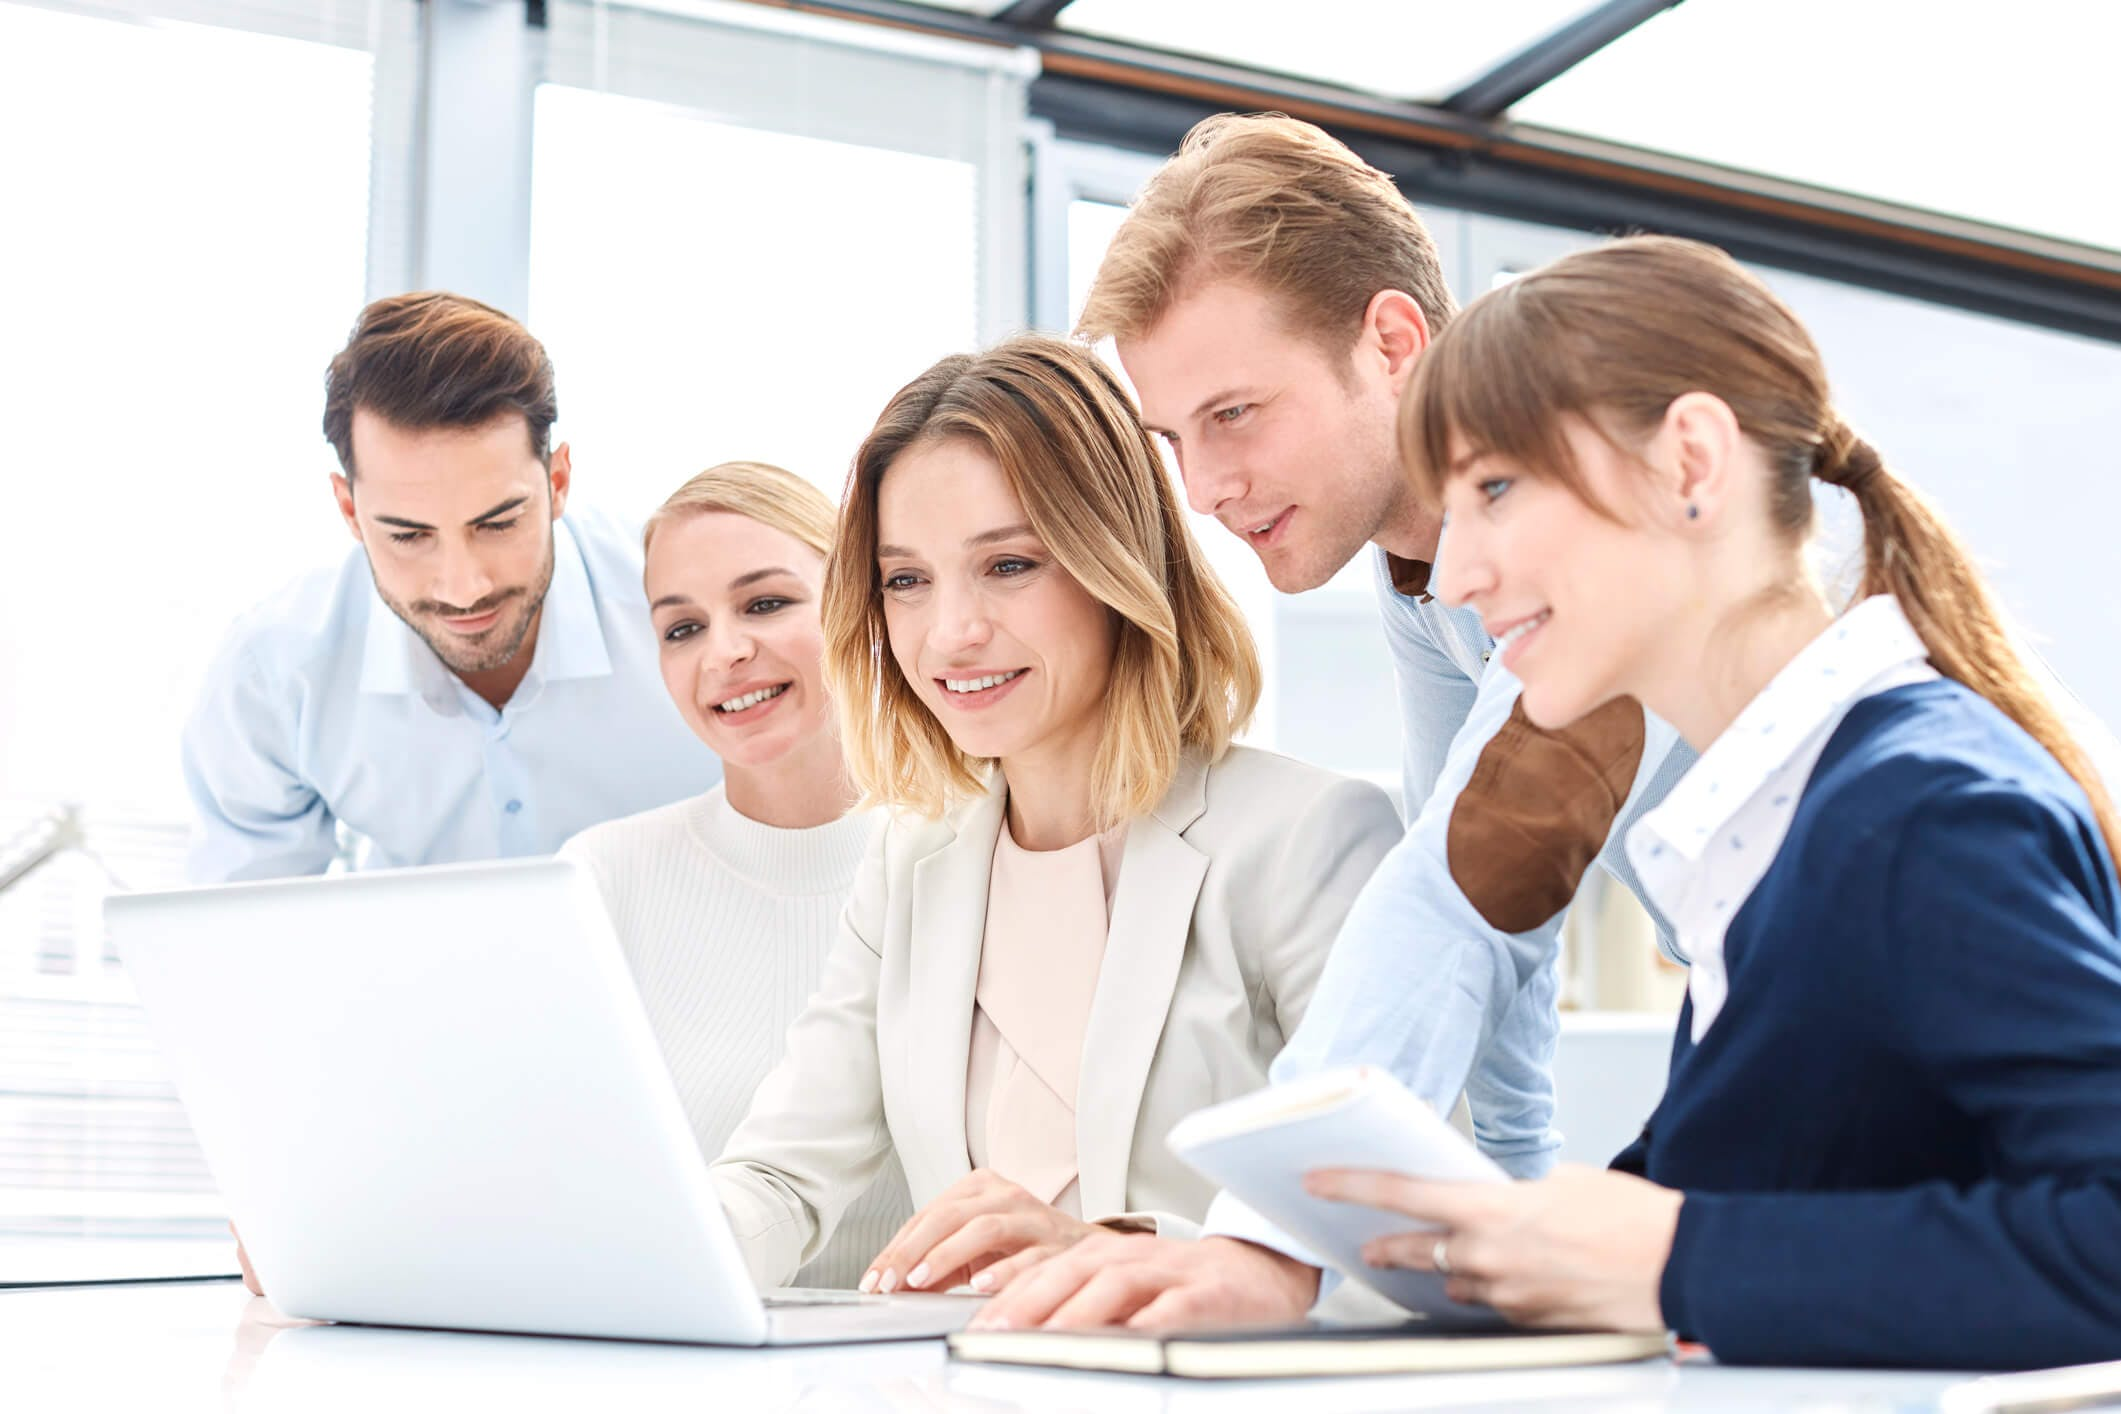 Titelbild-Team-Meeting-jung-Start-up-iStock-830494512-stockvisual